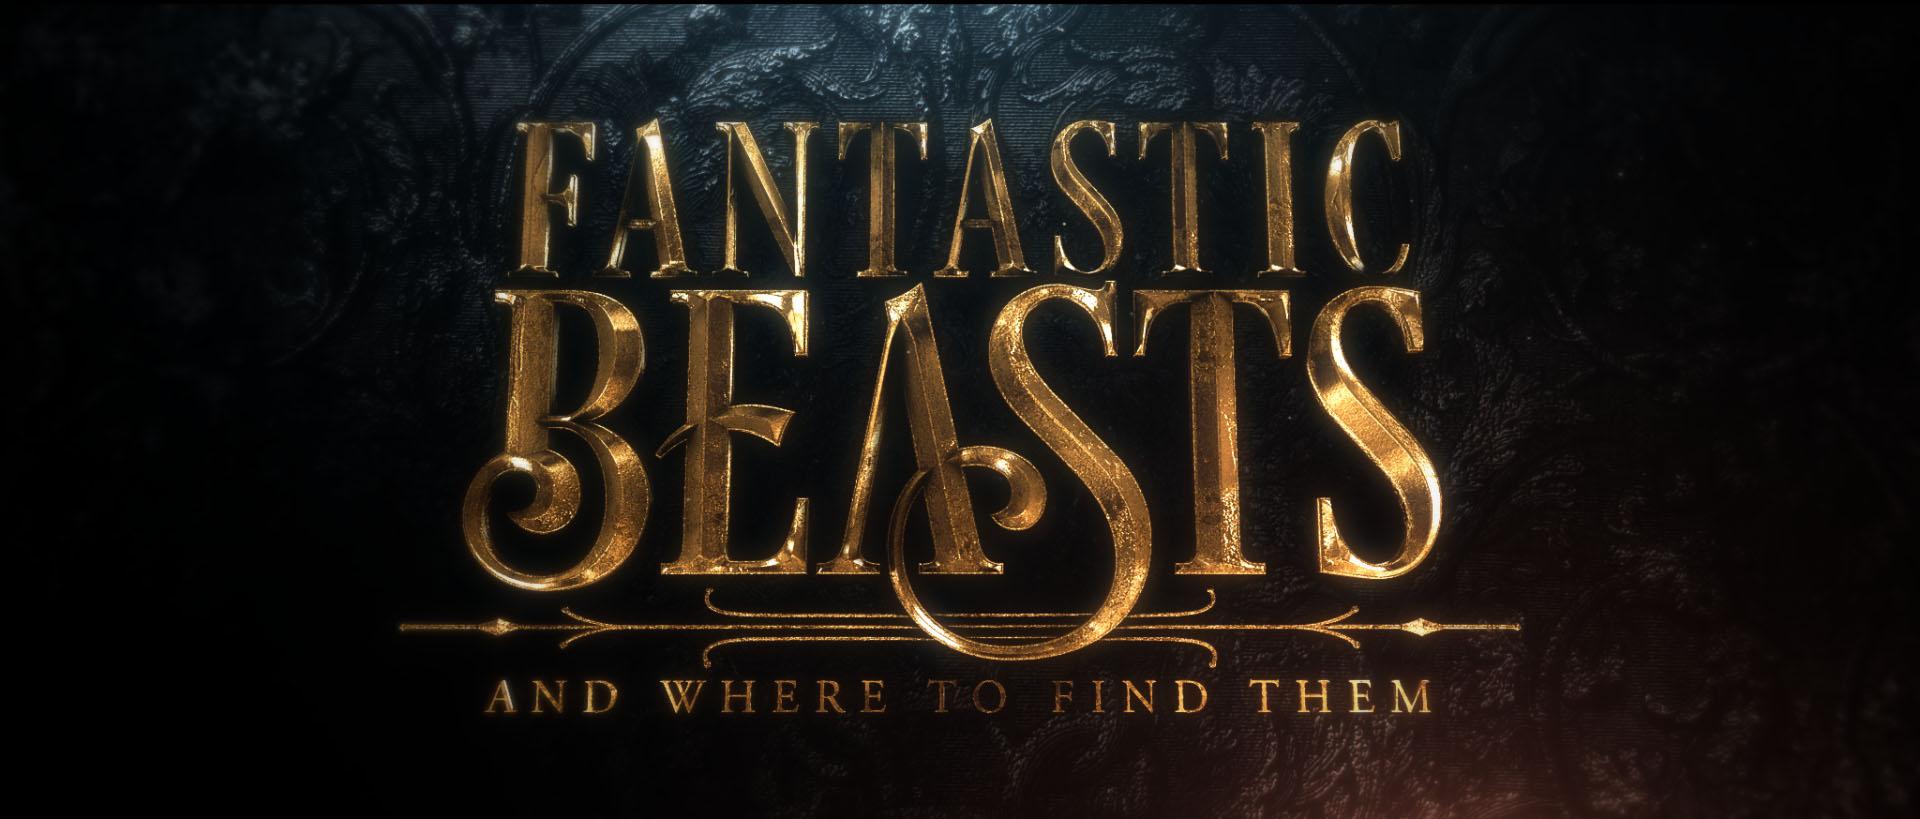 Alternative Logos for \'Fantastic Beasts\' Revealed.